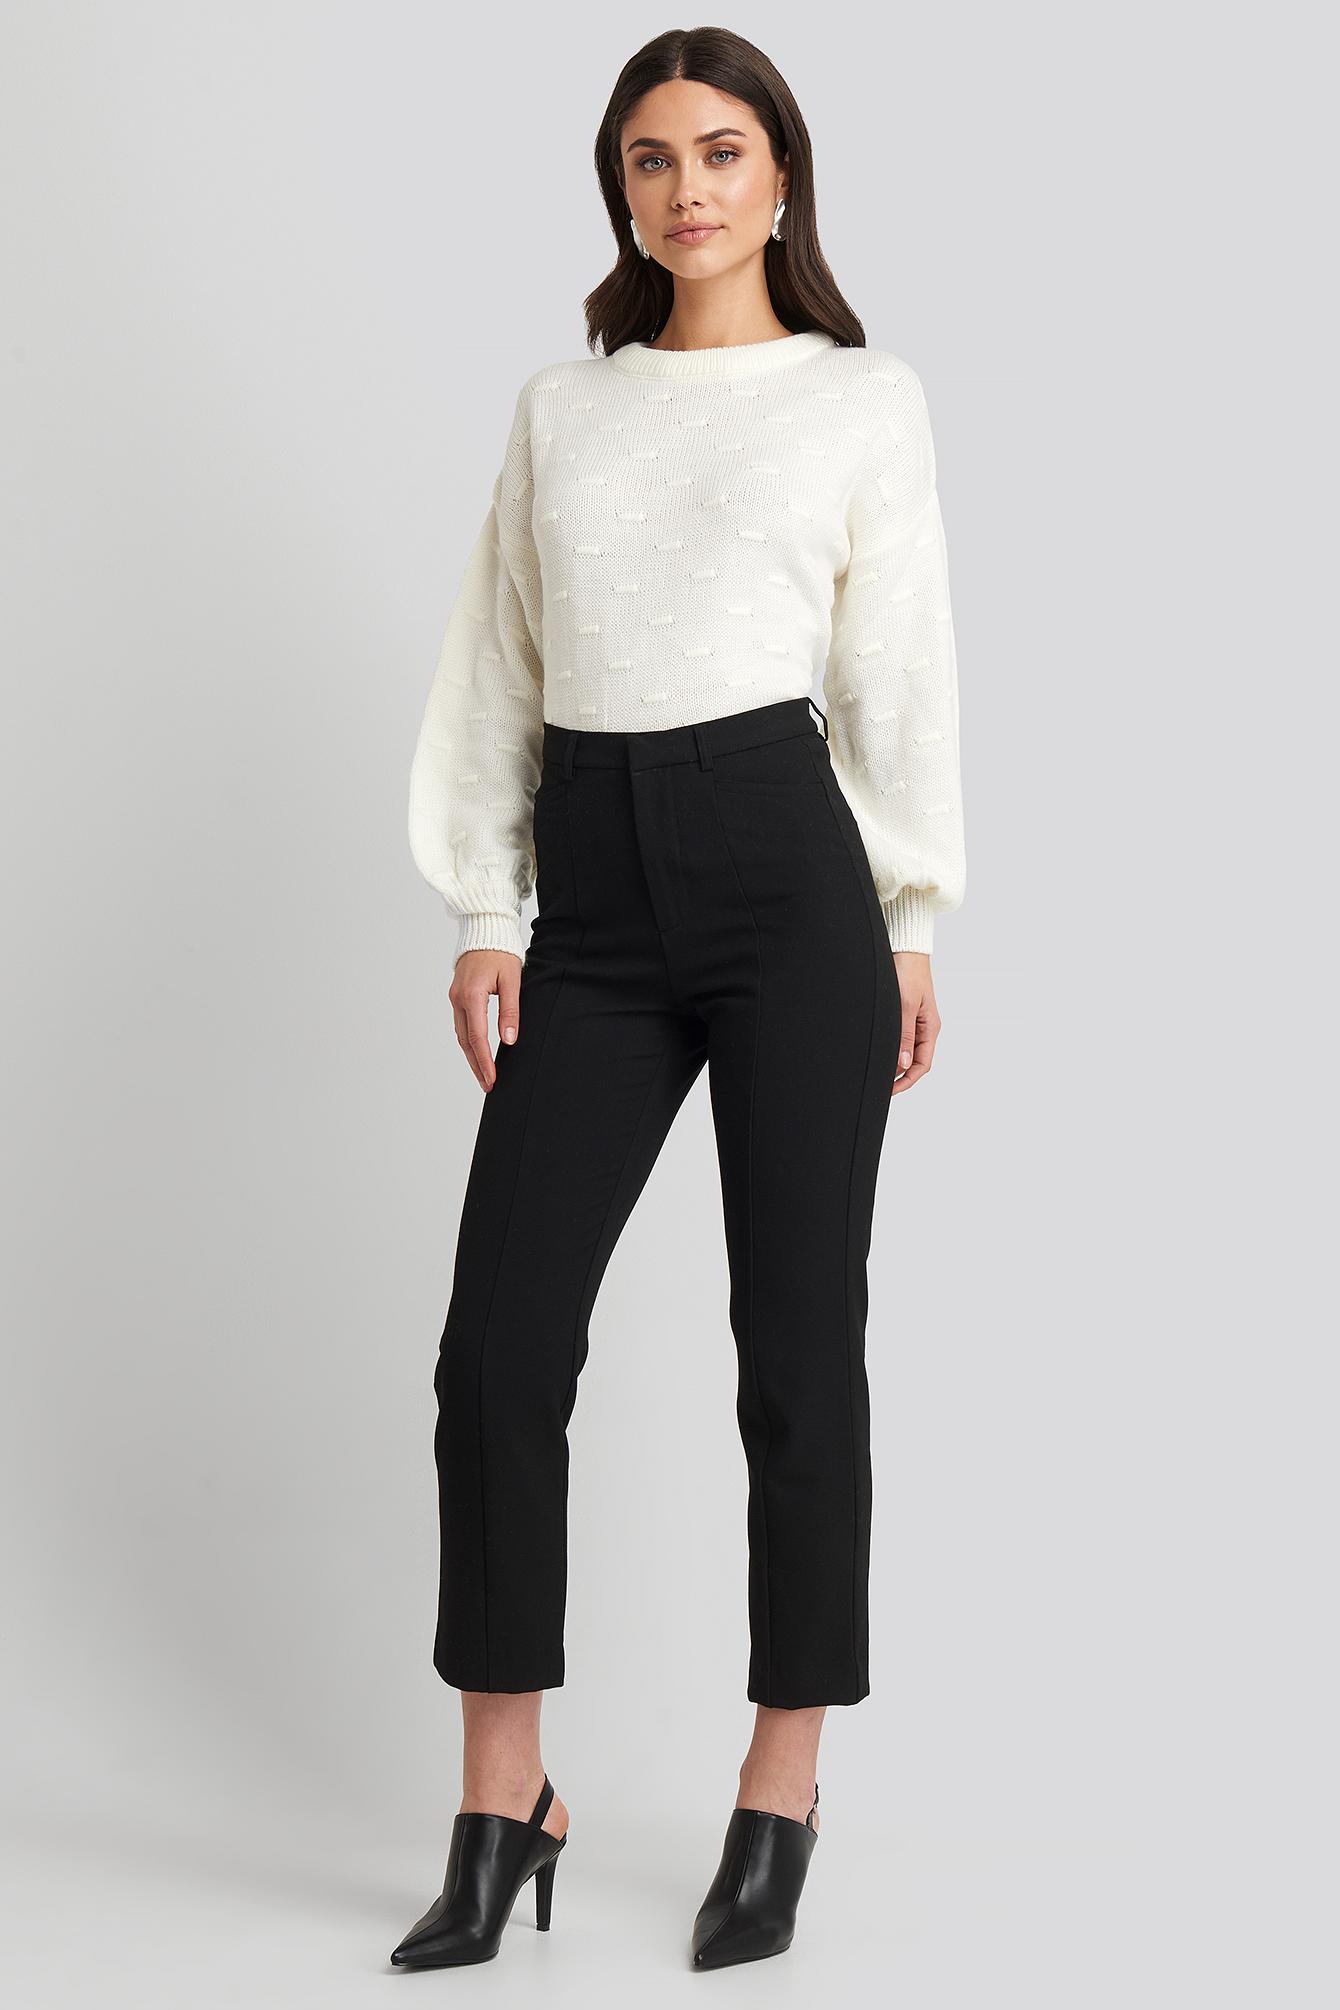 Seam Detail Straight Pants Black by Na Kd